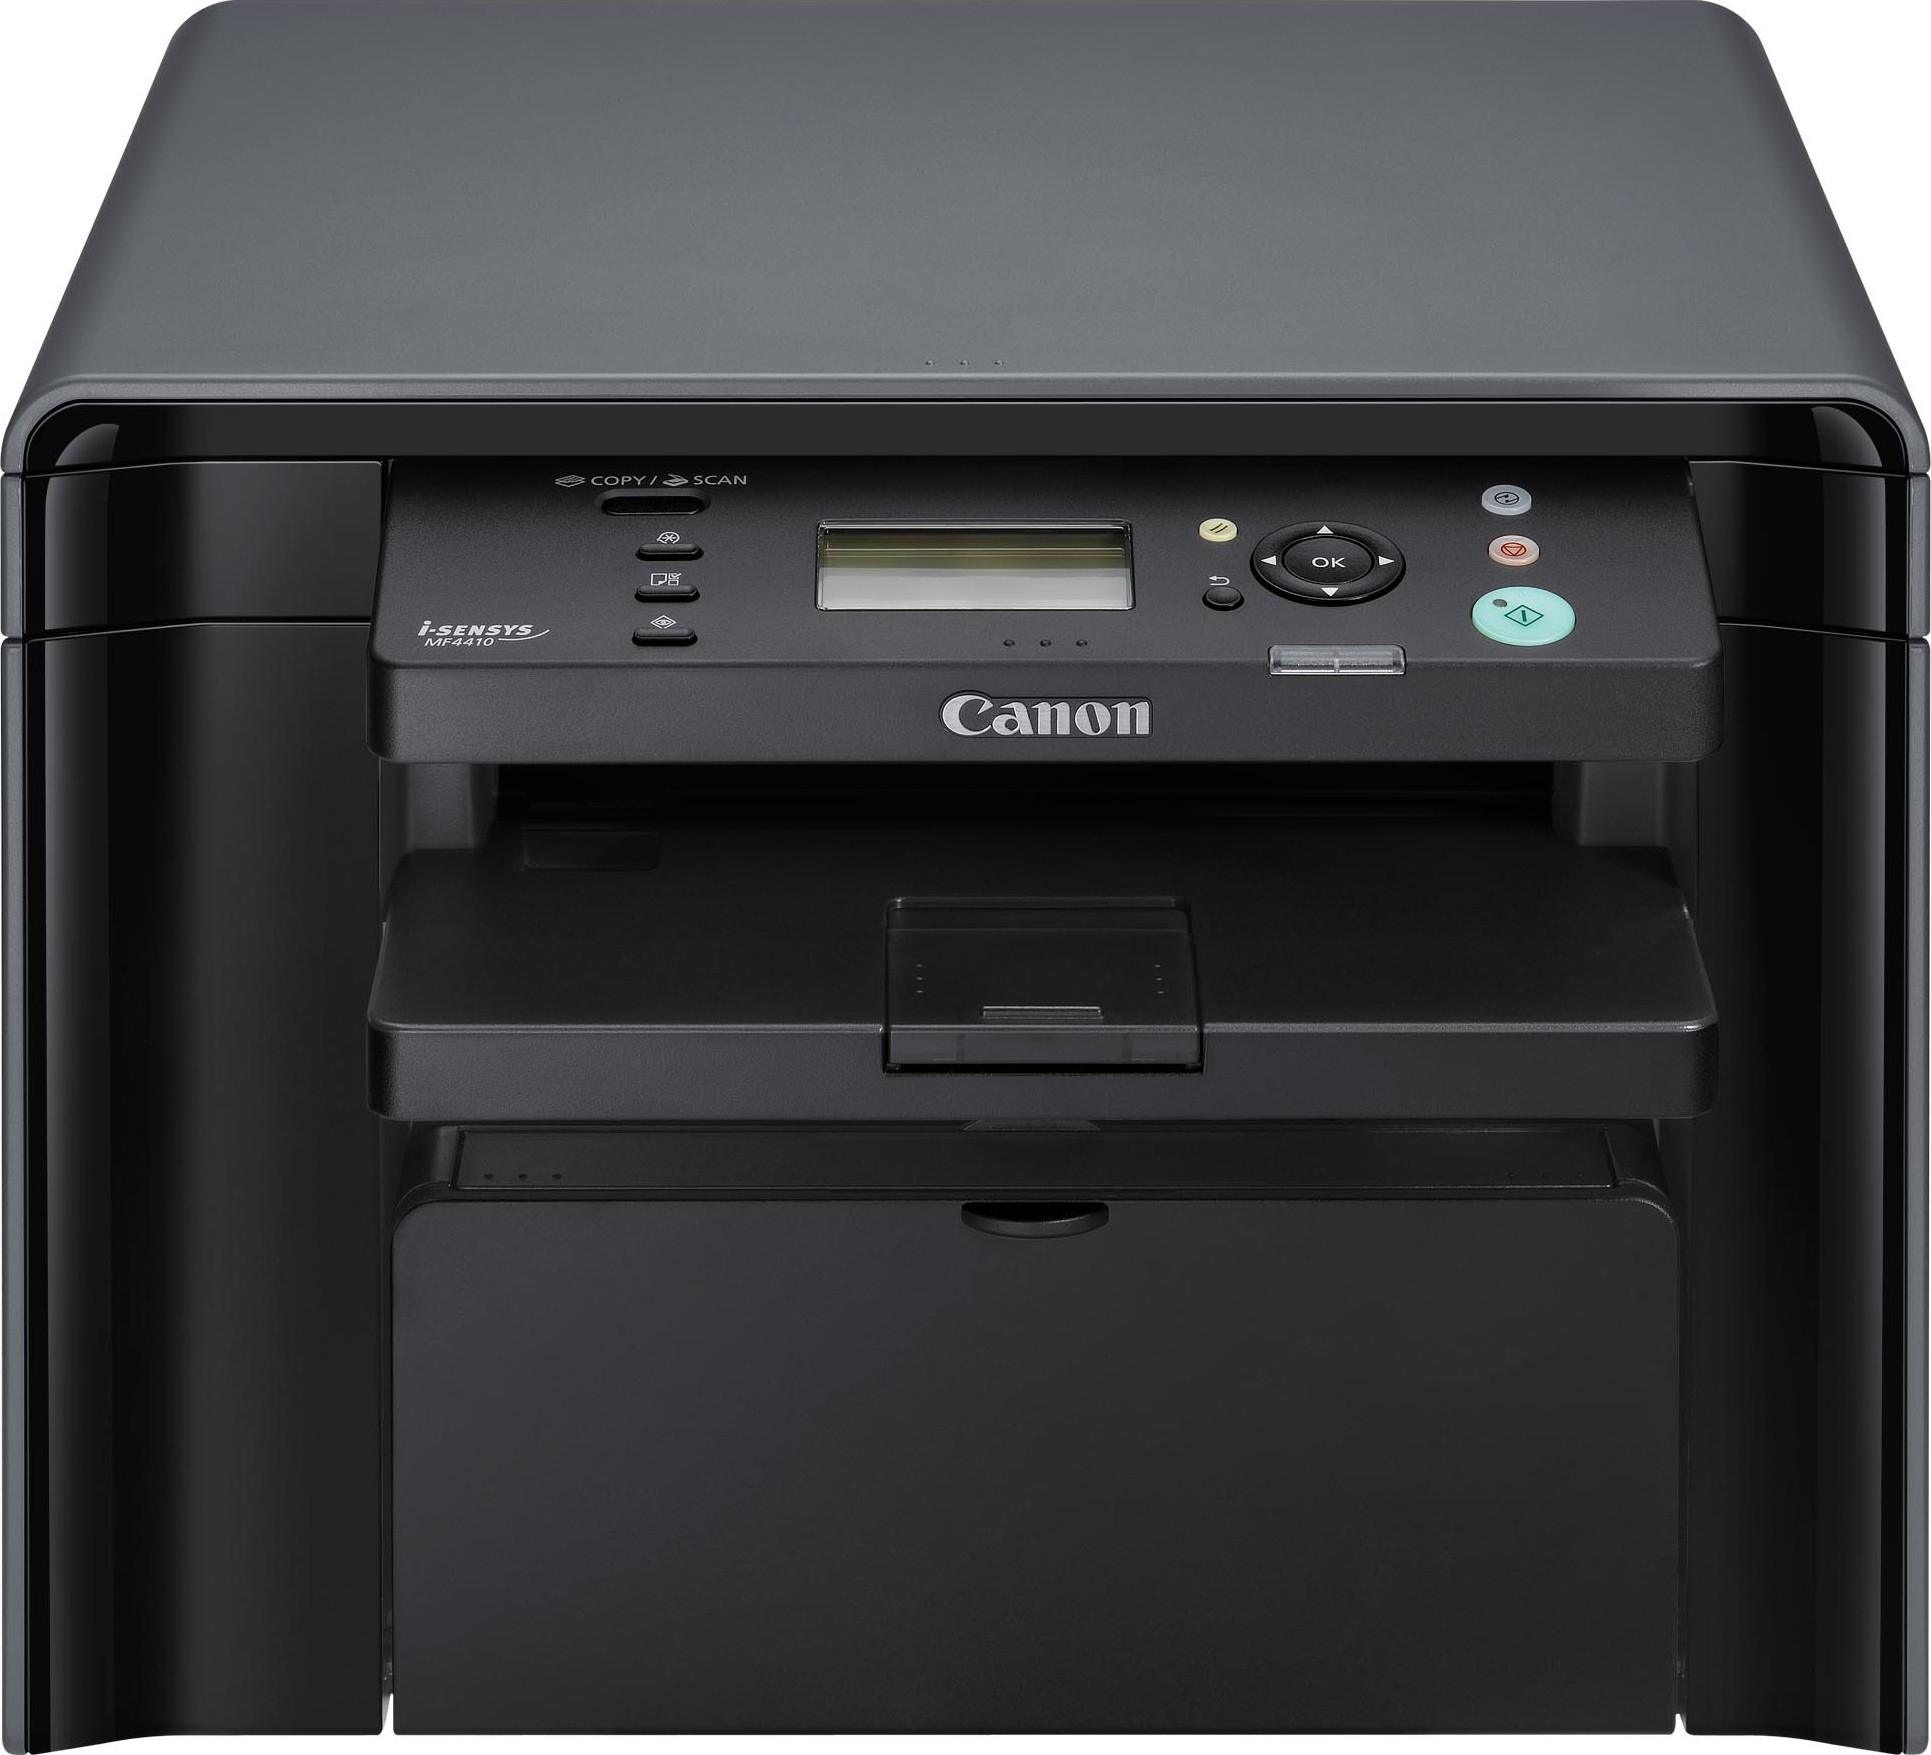 Canon mf4400 series driver download 64-bit | talptoptonu.